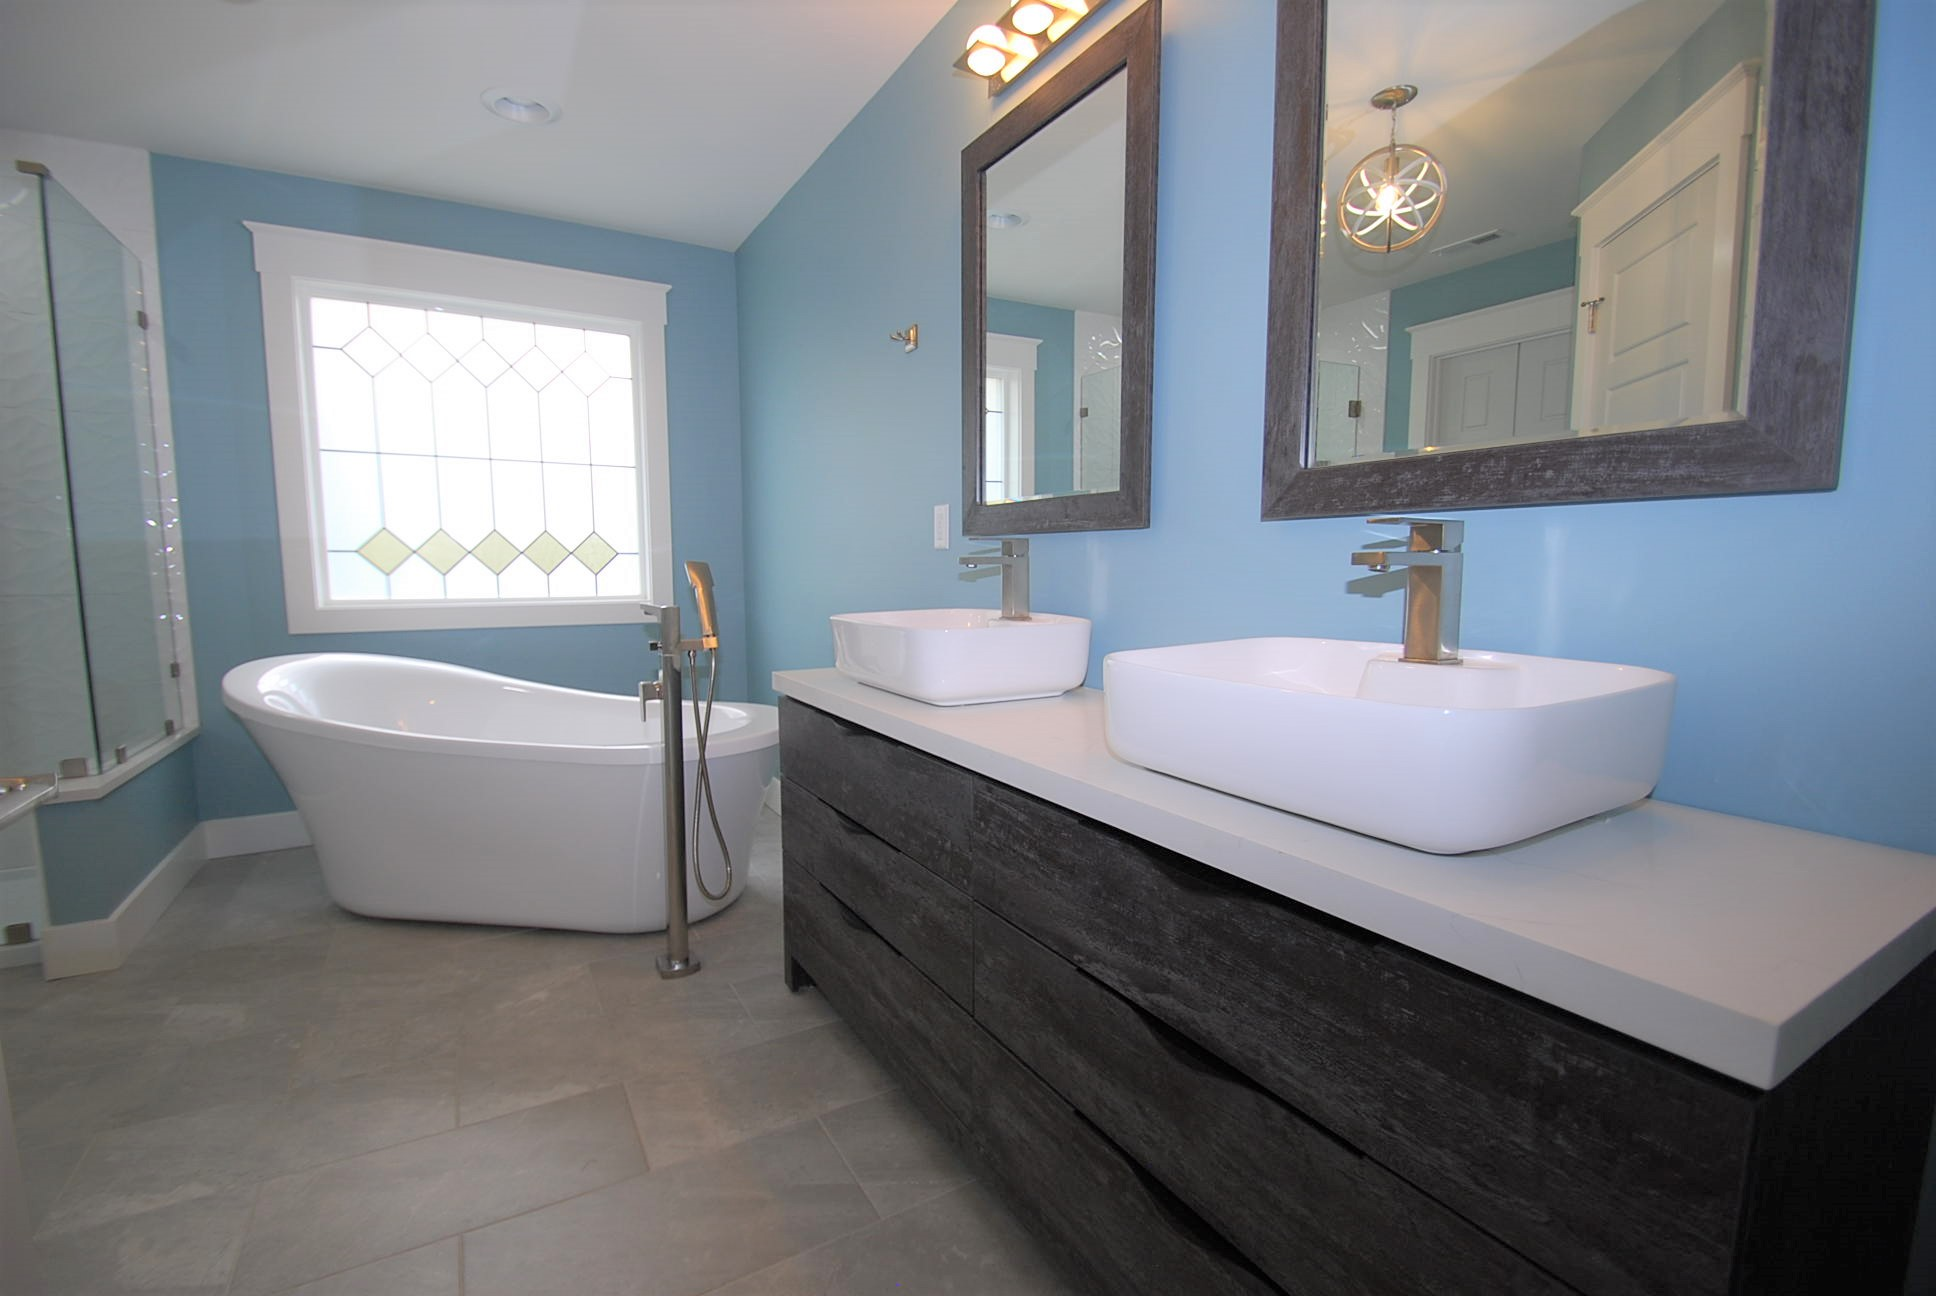 White Quartz Doble Vanity Top, Granite Concept, KY